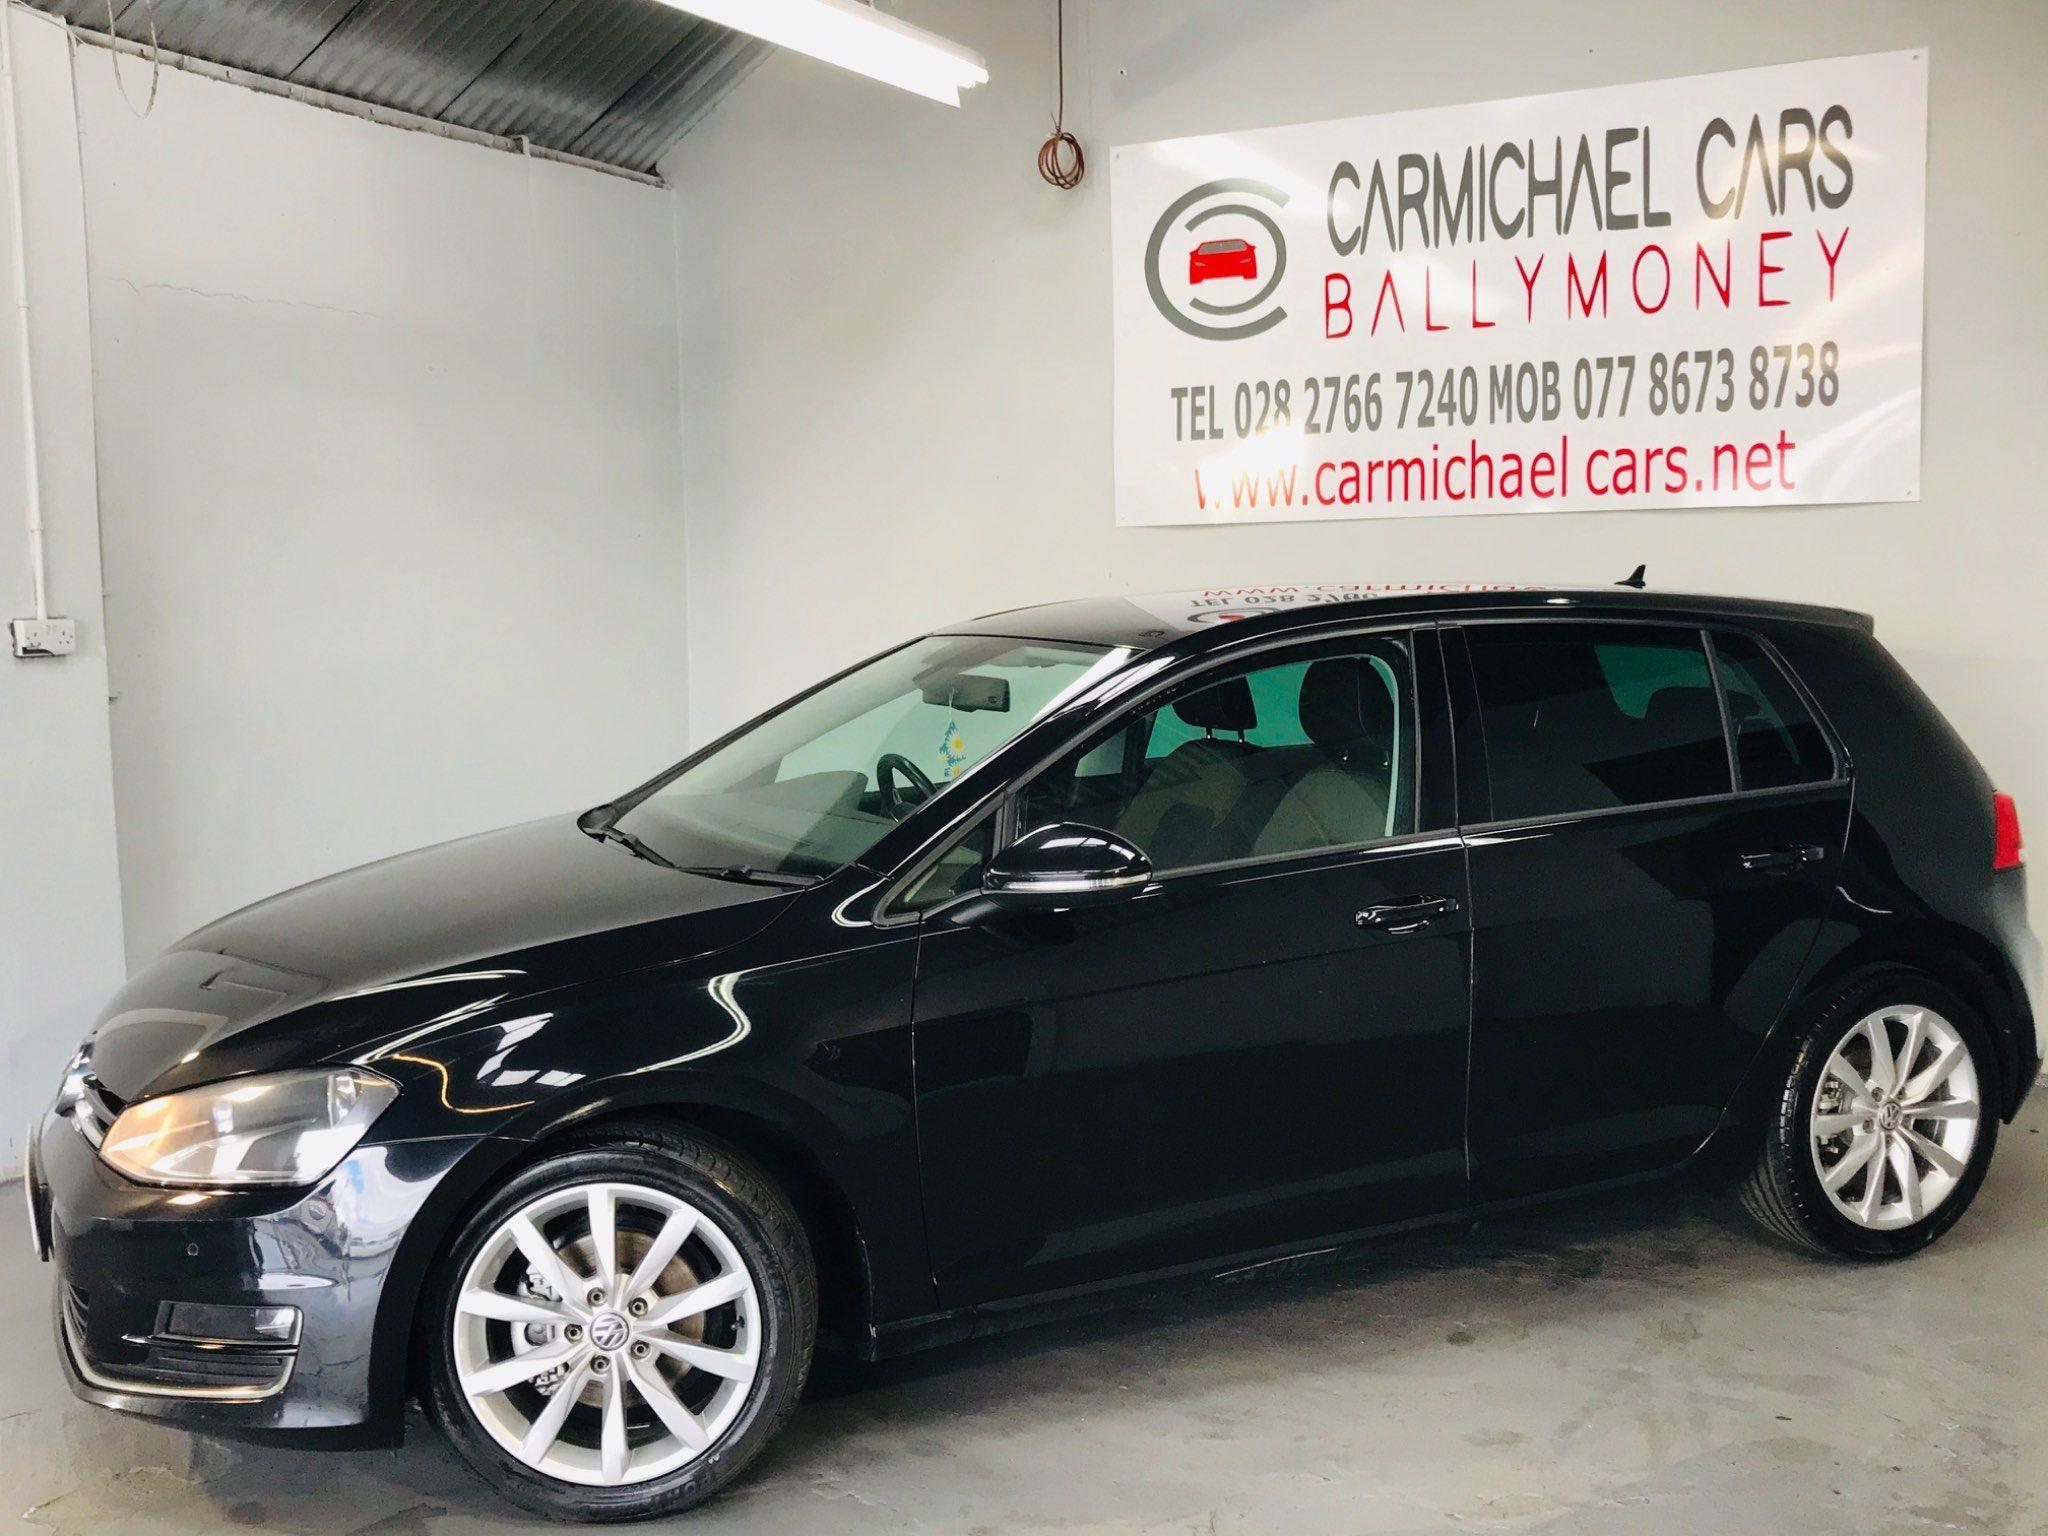 2013 VOLKSWAGEN Golf 2.0 TDI GT (s/s) Diesel Manual BLACK, 98K – Carmichael Cars Ballymoney full